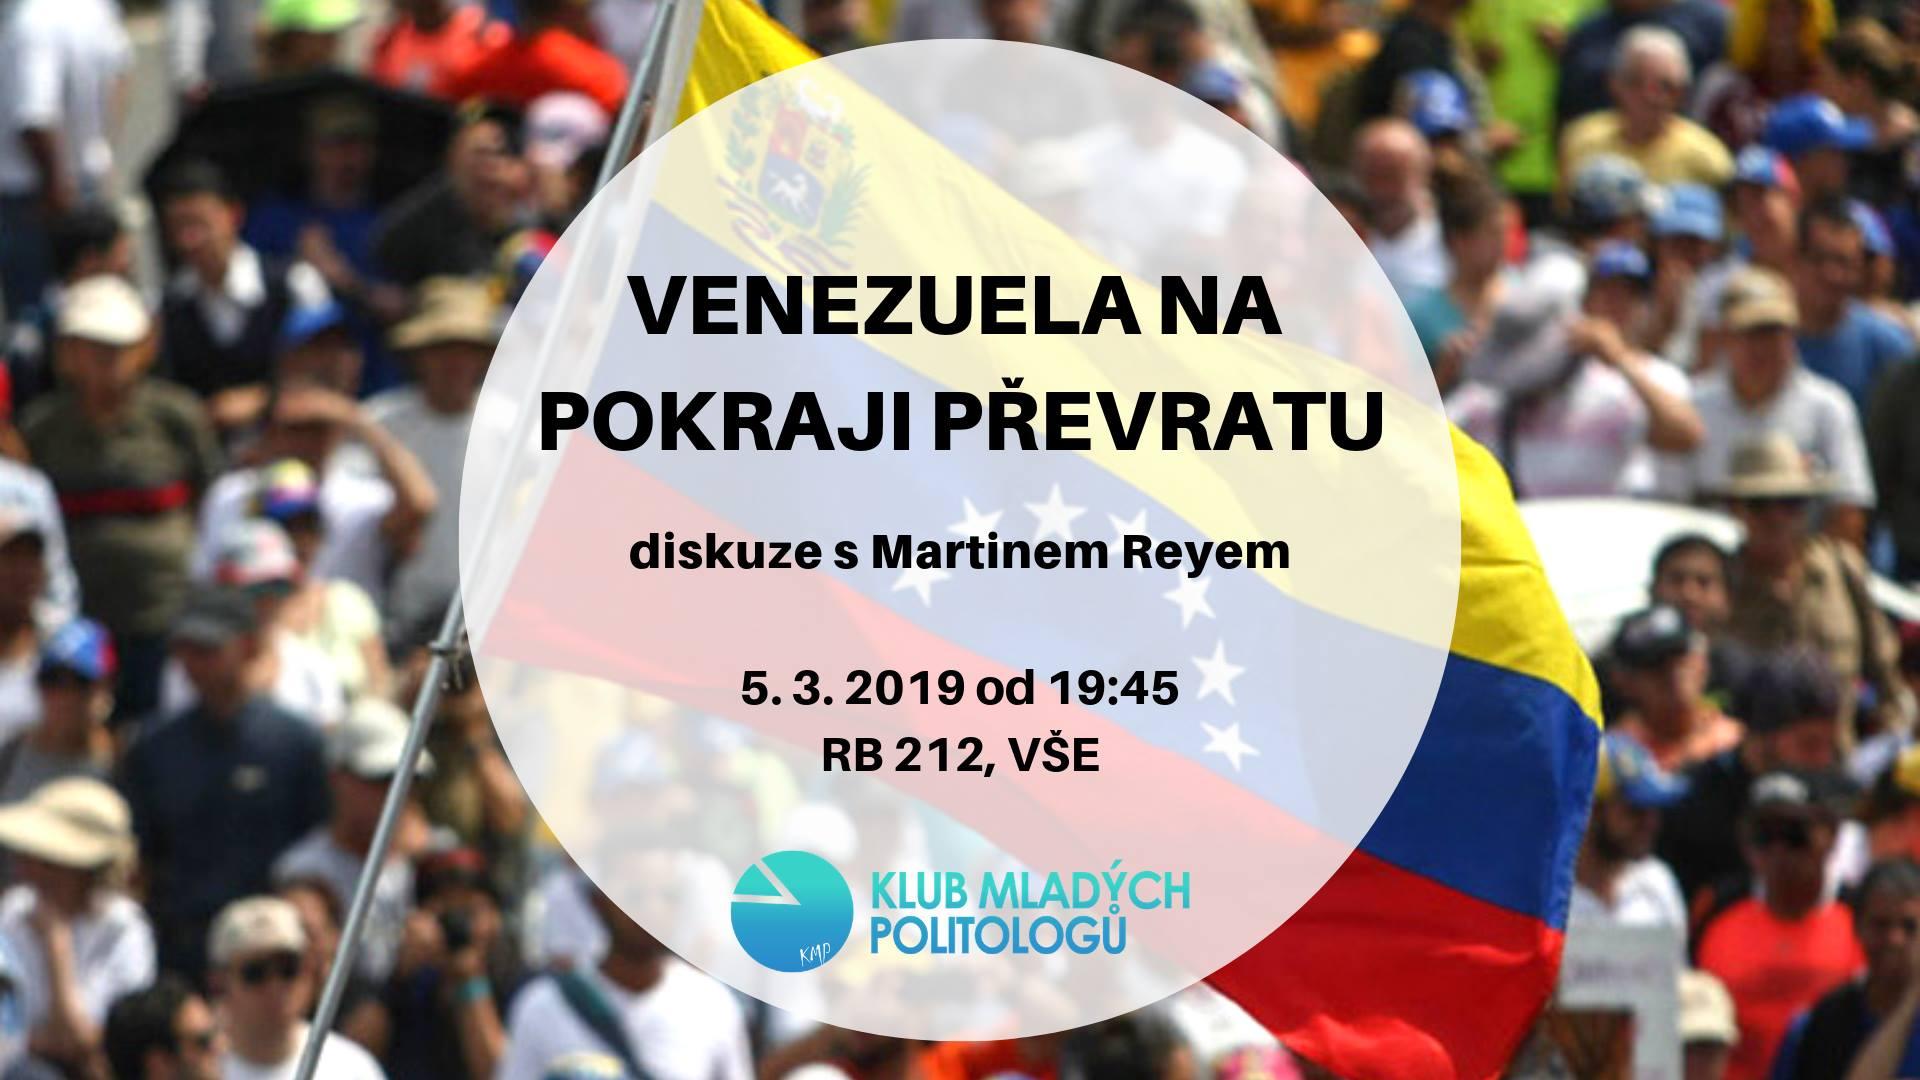 Venezuela na pokraji převratu